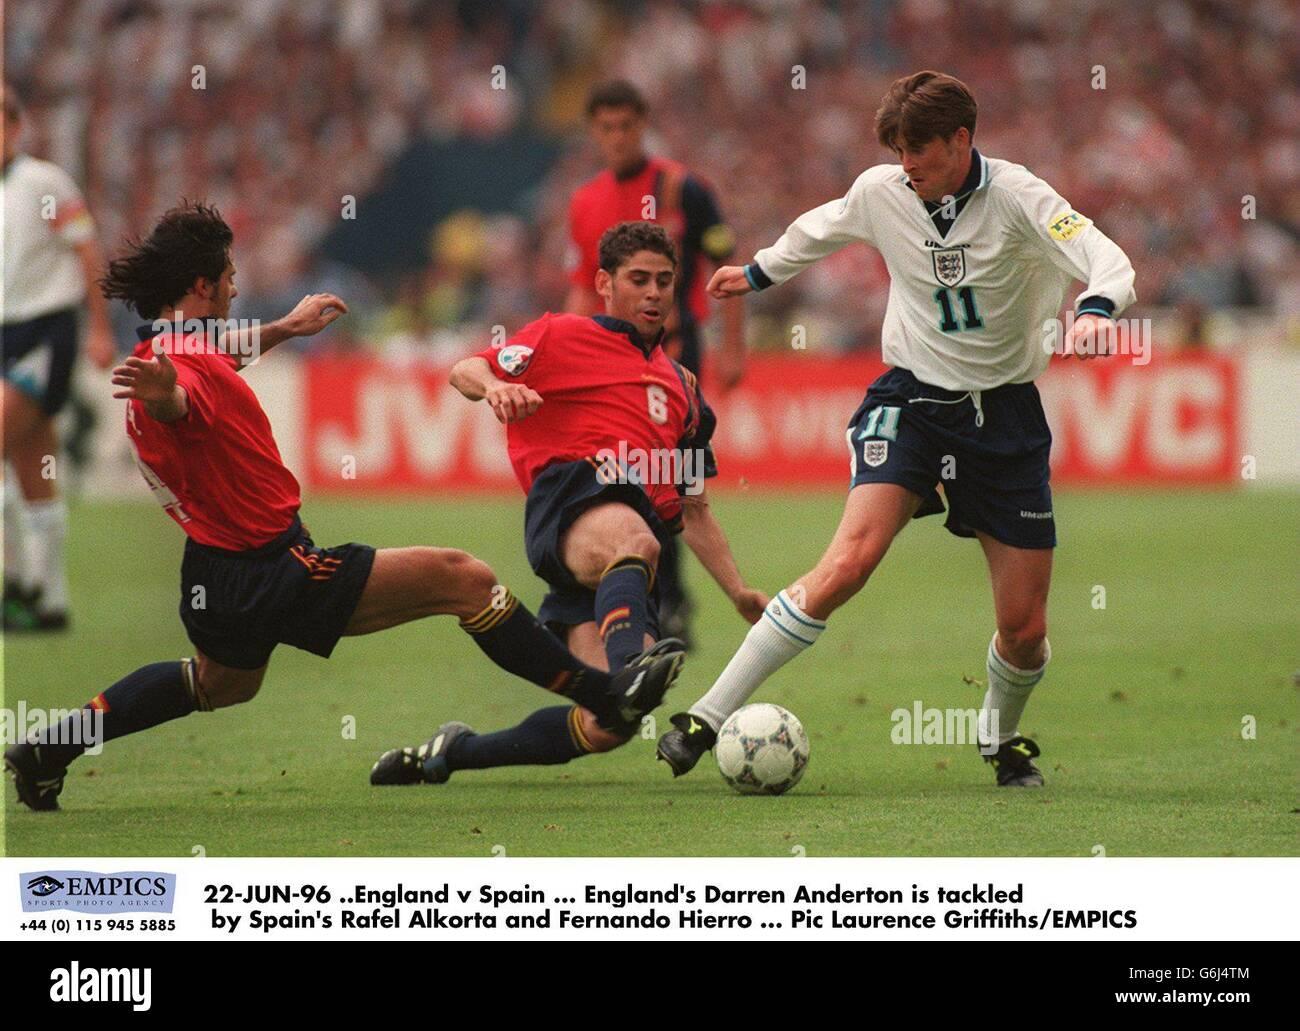 22-JUN-96 .England v Spain. England's Darren Anderton is tackled by Spain's Rafel Alkorta and Fernando Hierro Stock Photo